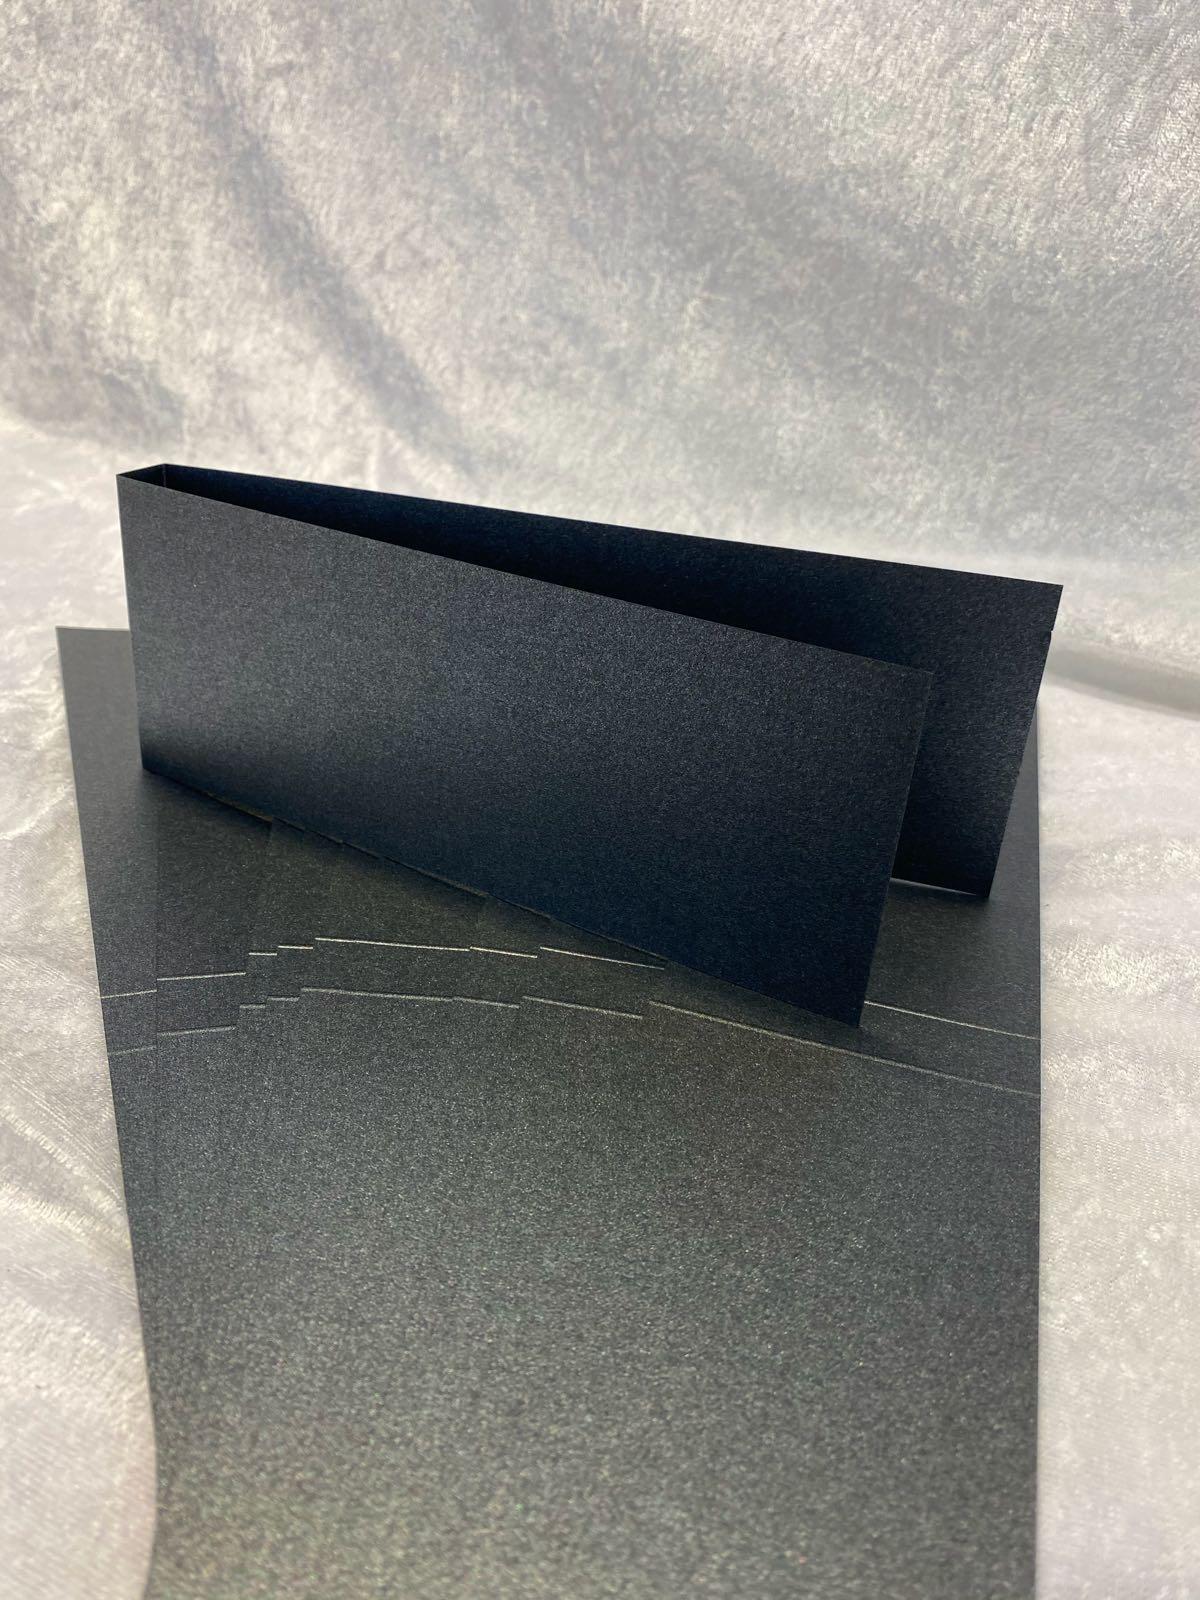 Slimcard base shimmer blå. TILBUD: 10 stk. kun kr 25,-